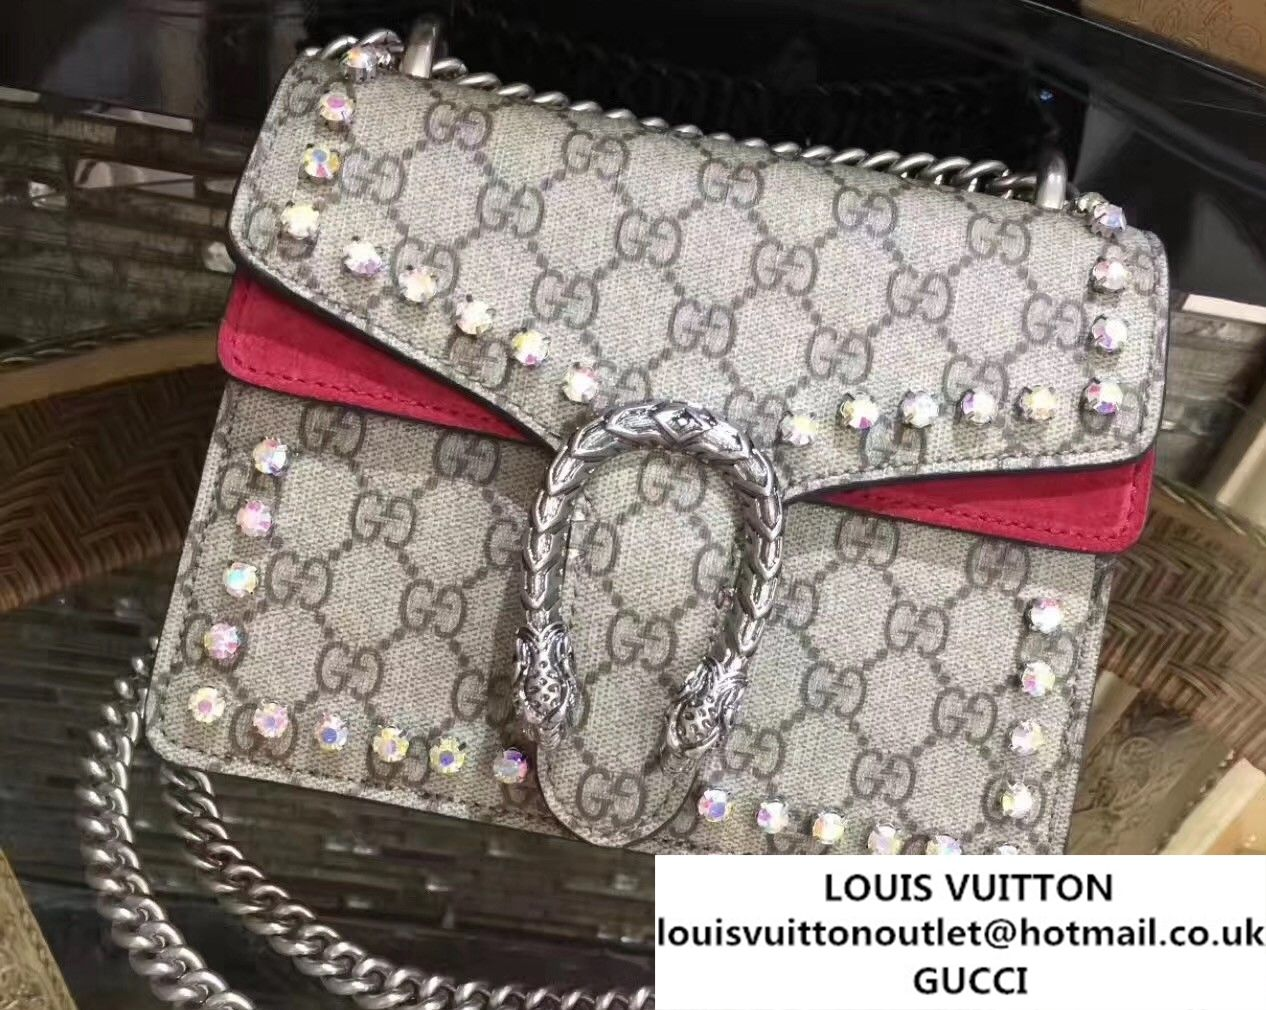 83963a36b1e Gucci Mini Dionysus Crystal GG Supreme Canvas Shoulder Bag 421970 2017